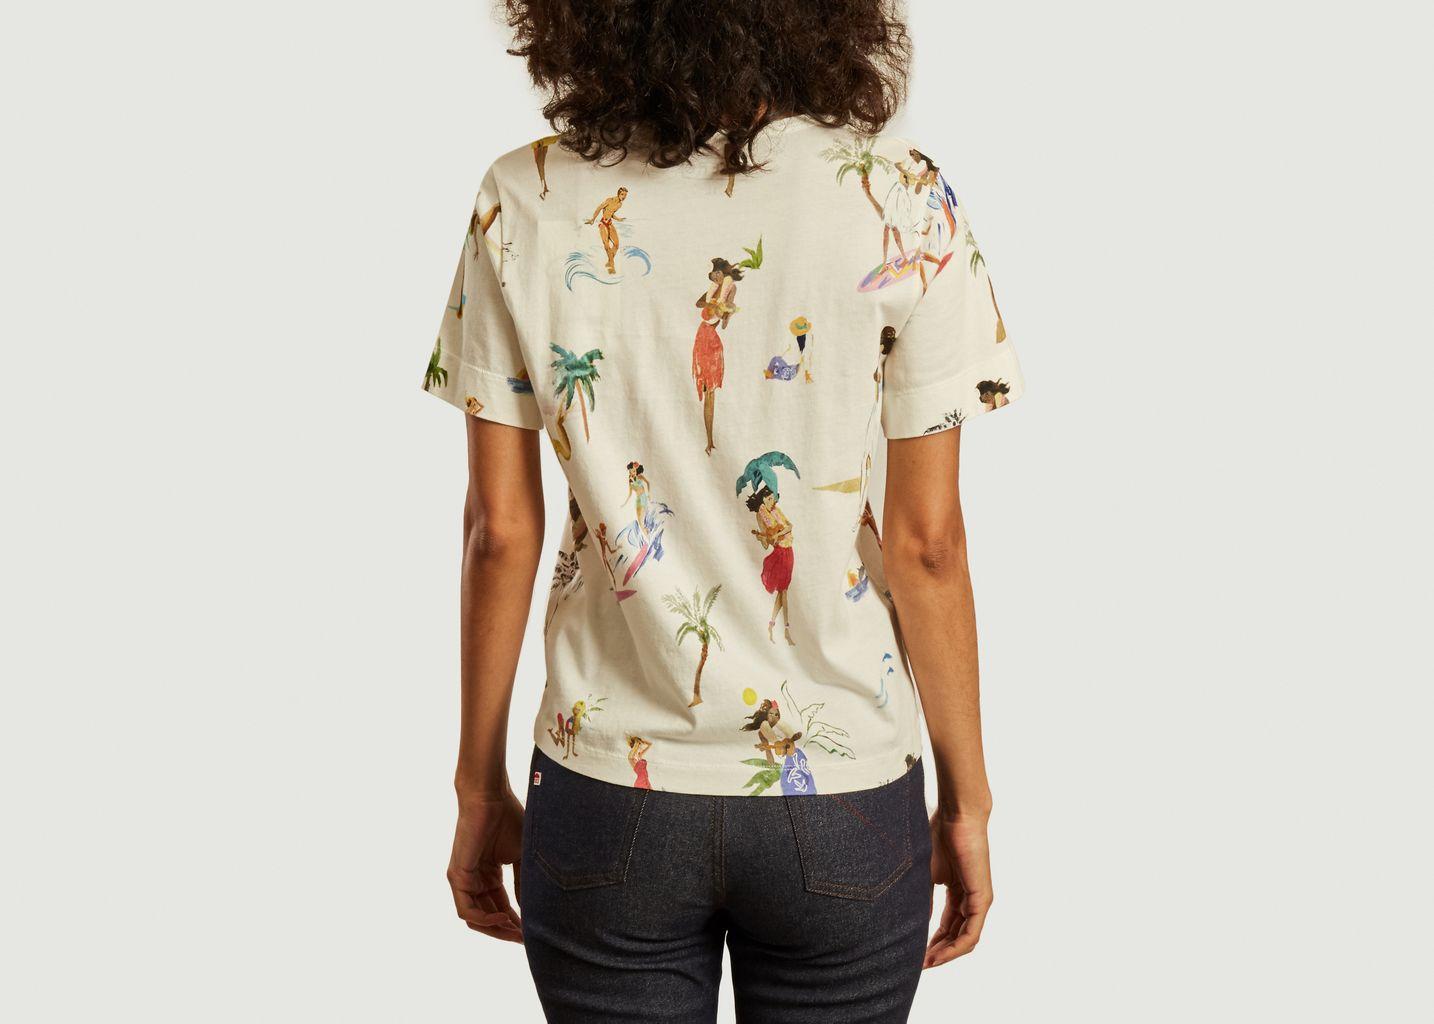 T-shirt en coton Yukuleles Small - G.Kero